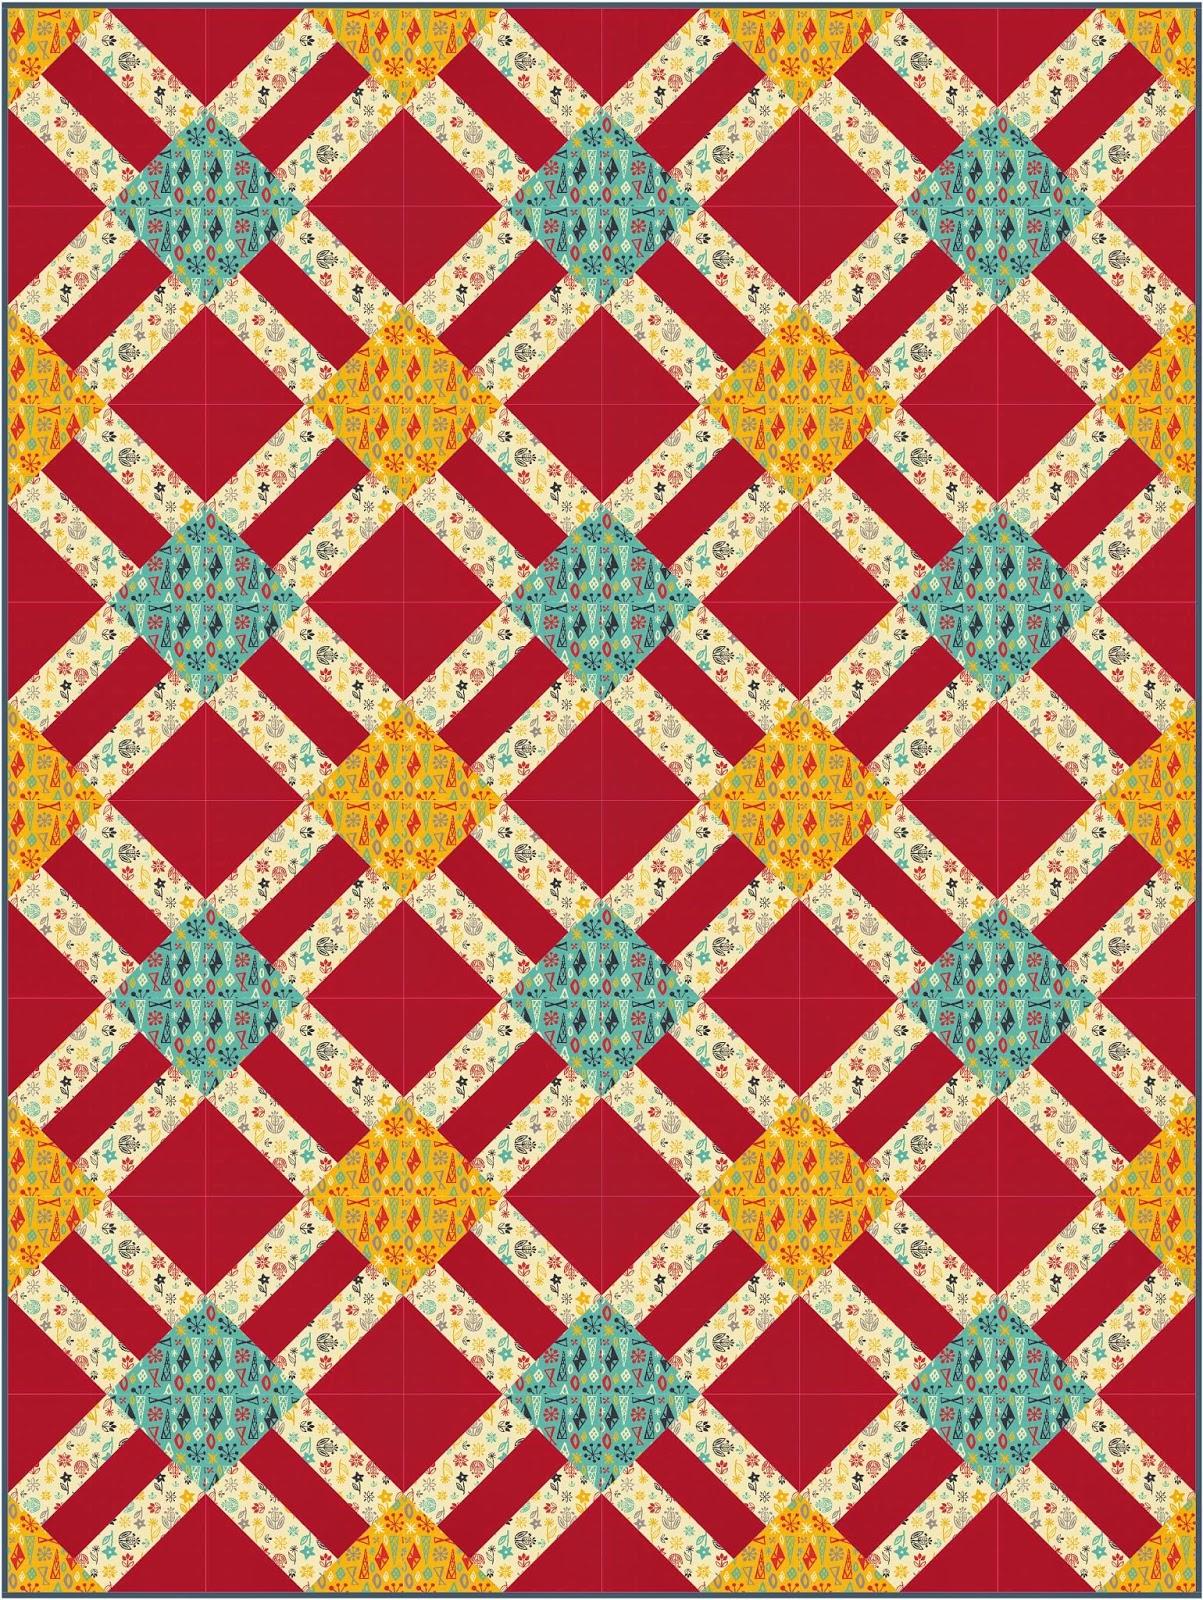 ... Designs: Cracker Lattice - A Free Quilt Pattern from Camelot Fabrics